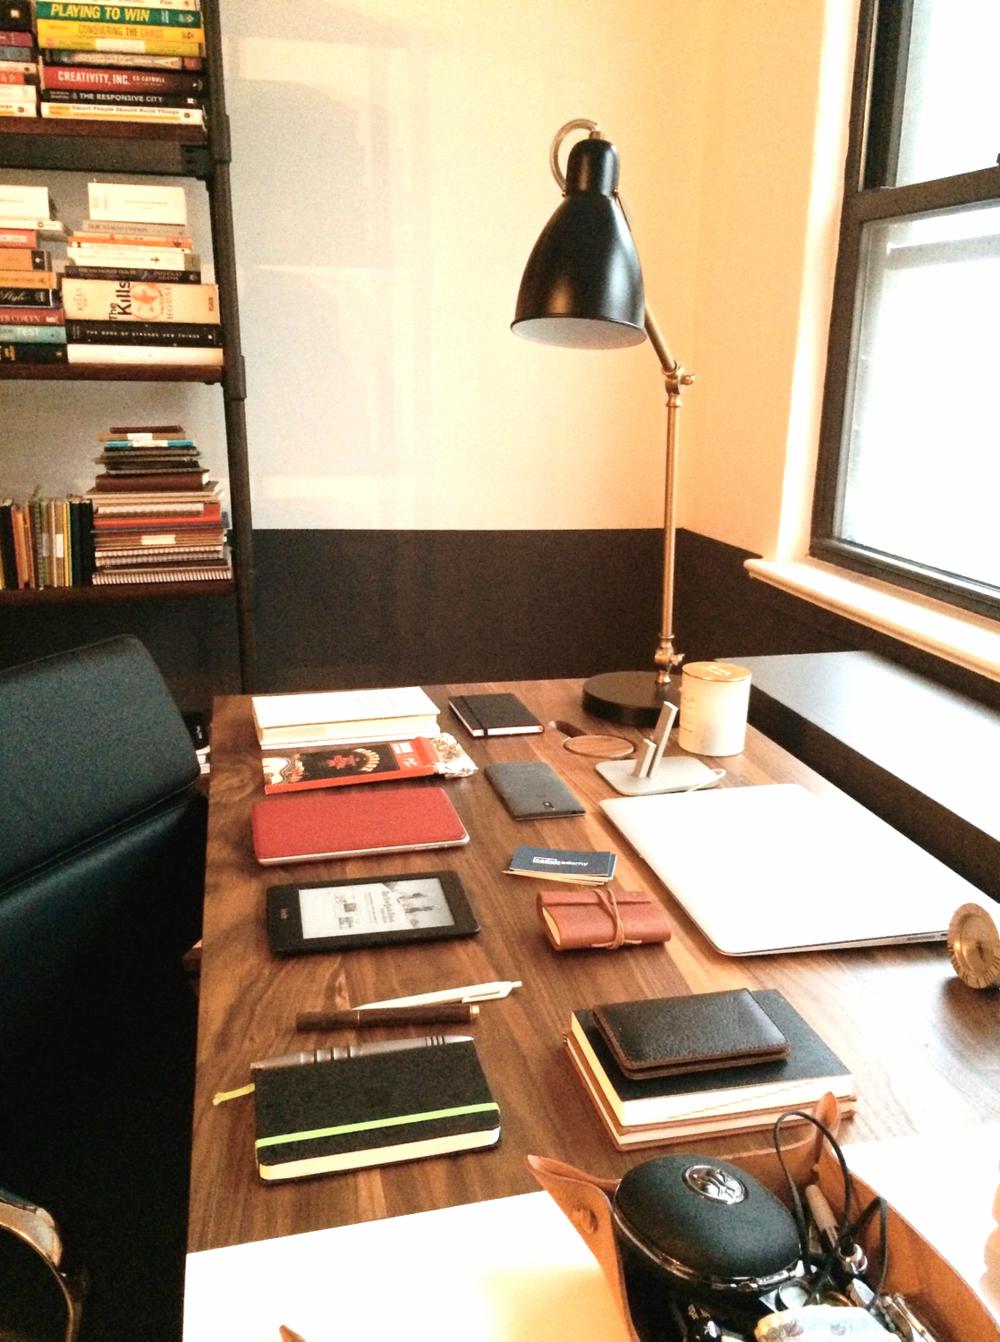 Zach's desk at home.